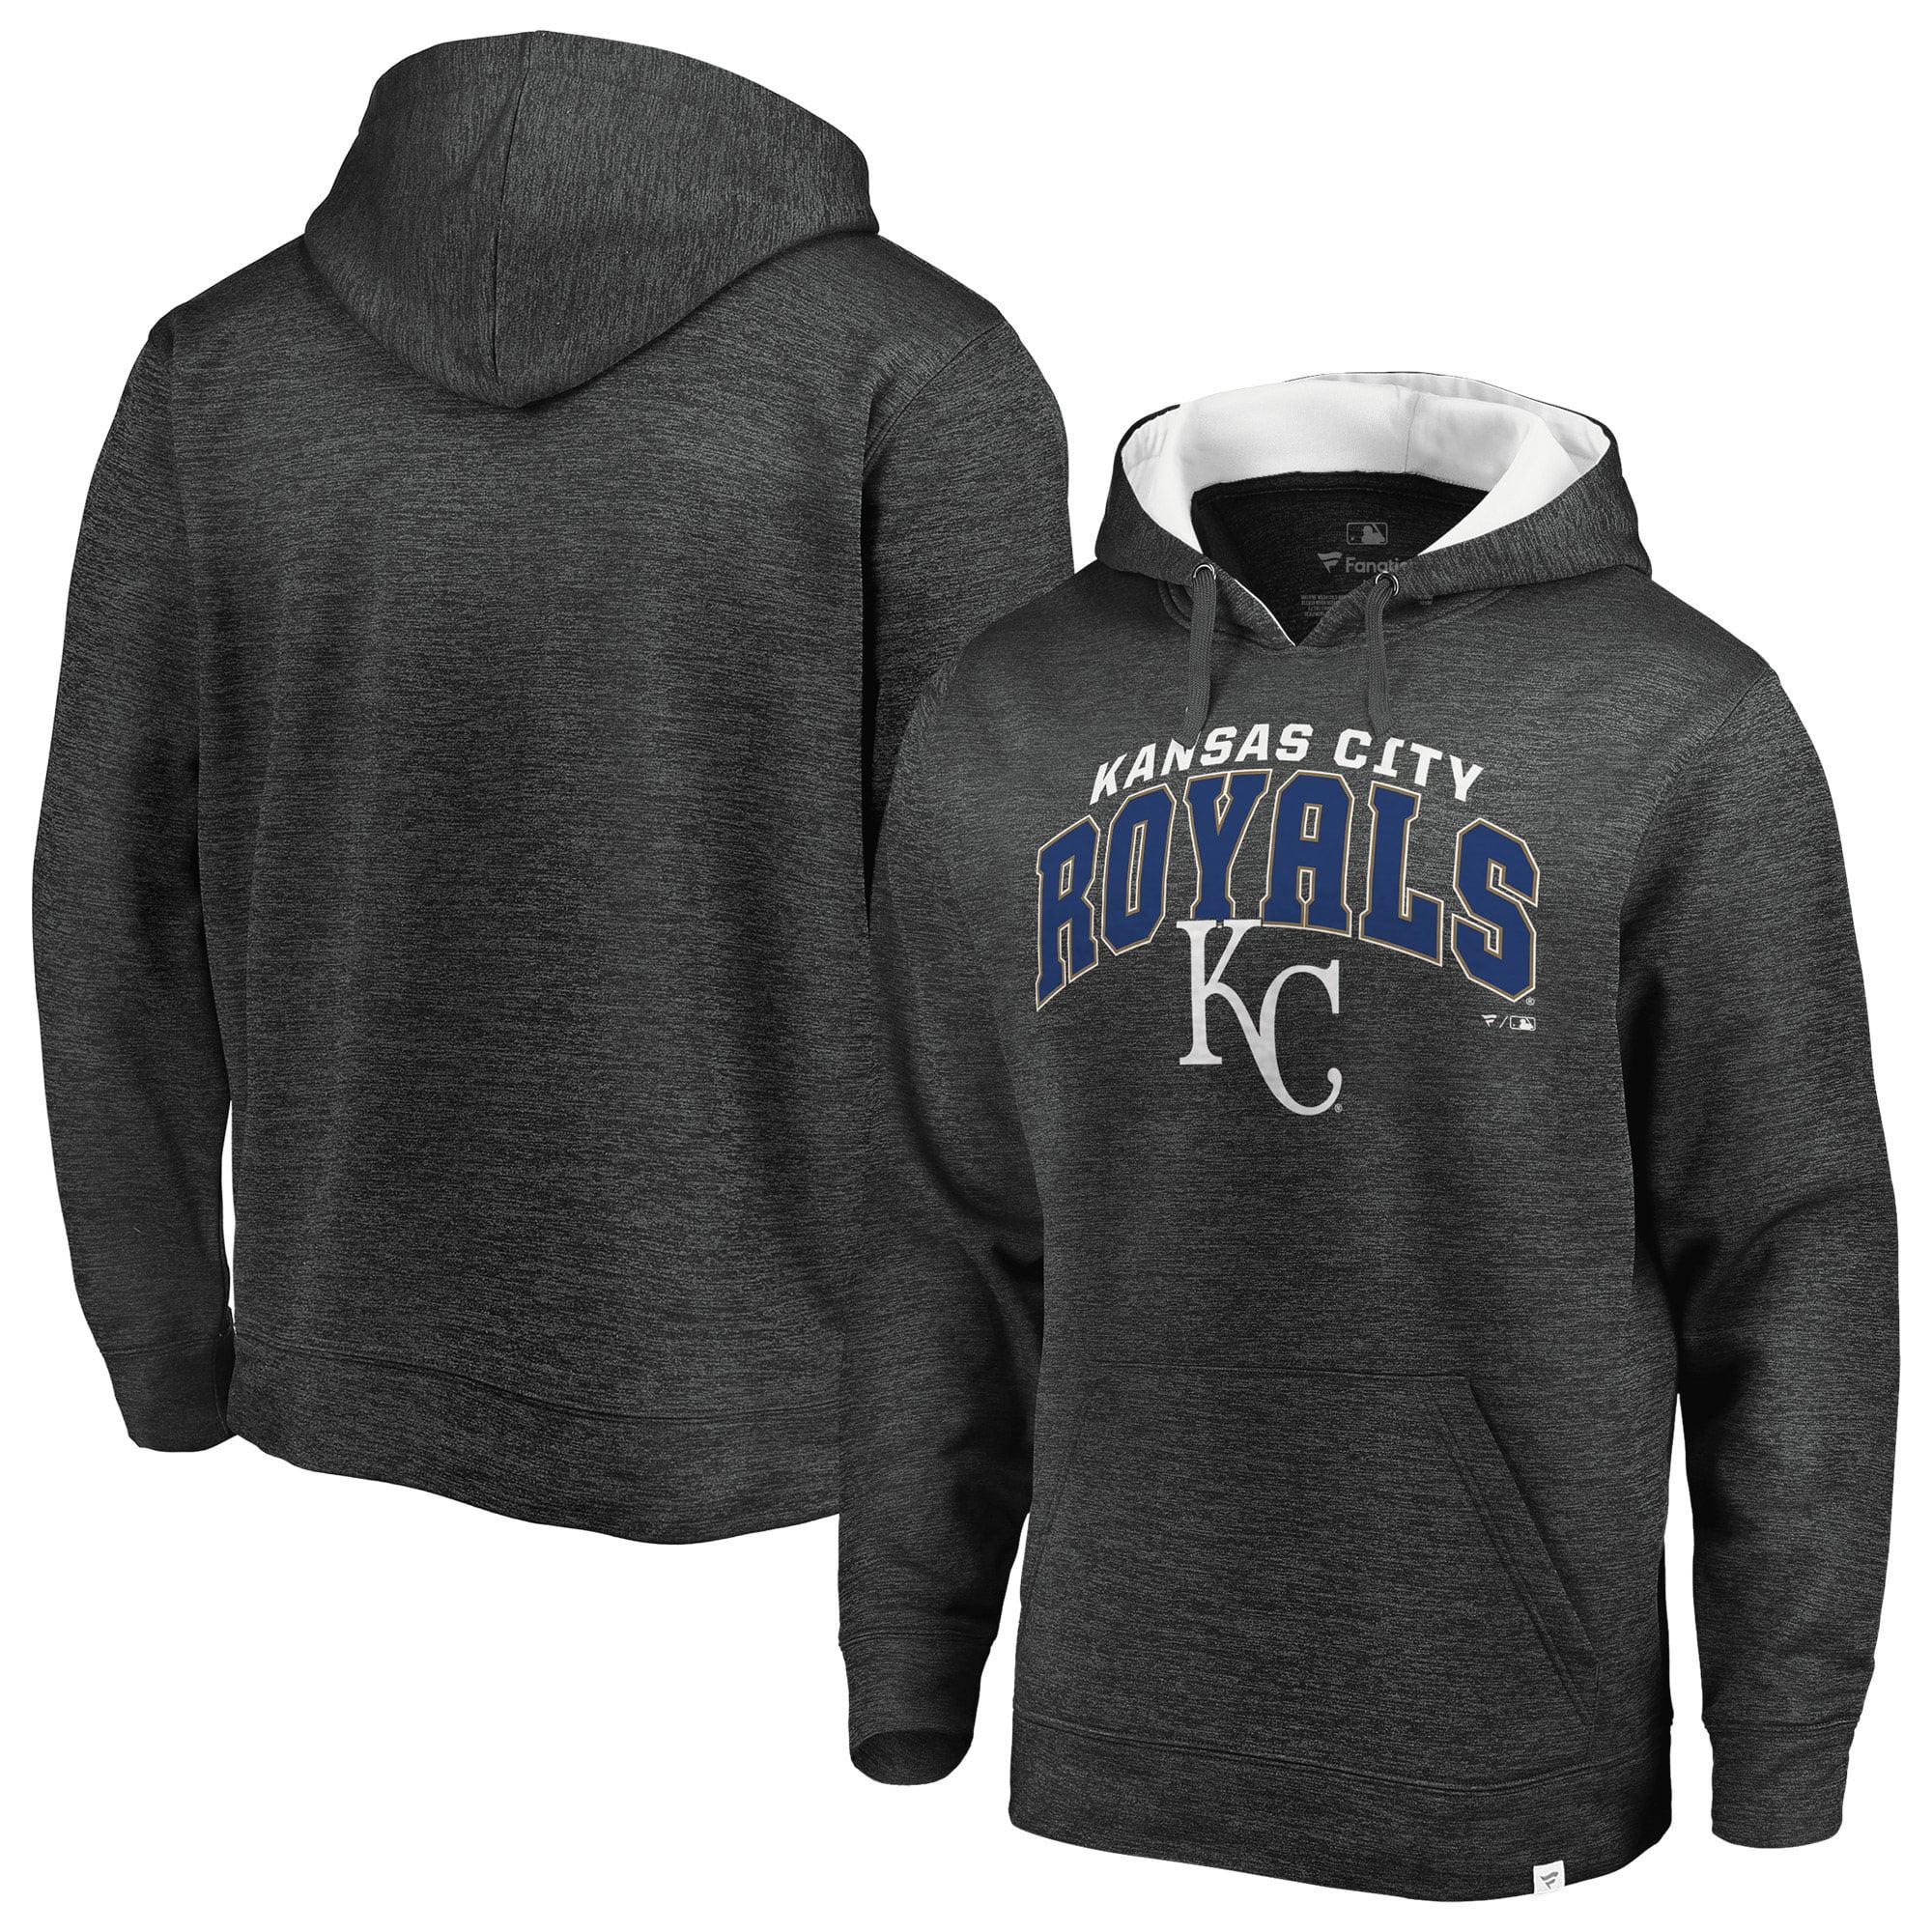 Kansas City Royals Fanatics Branded Steady Fleece Pullover Hoodie - Gray/White